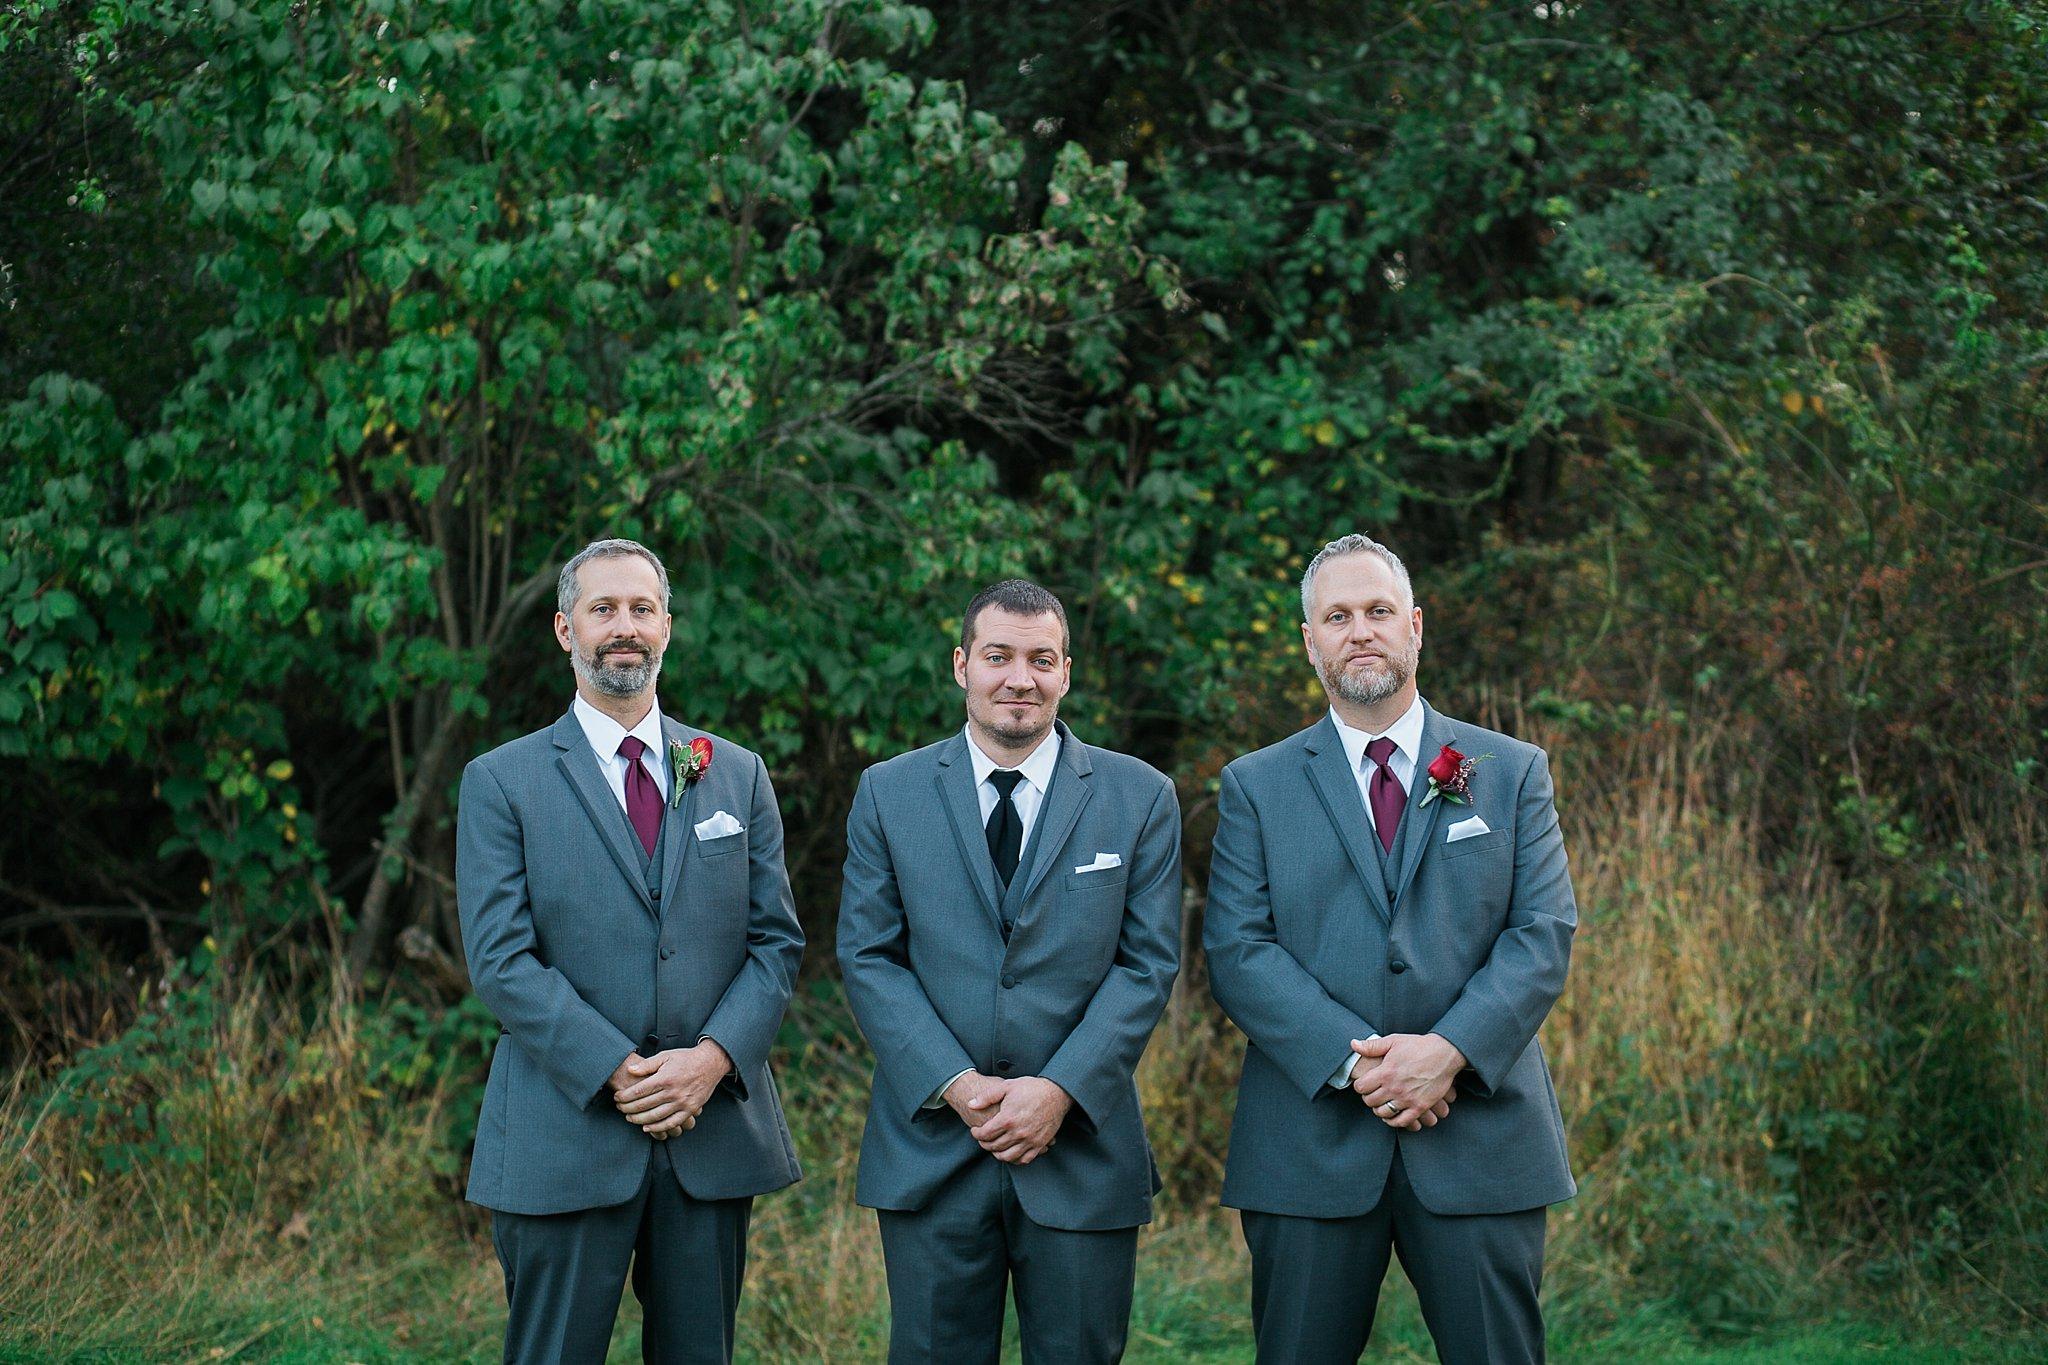 New Windsor New York Hudson Valley New York Wedding Photographer 59.jpg